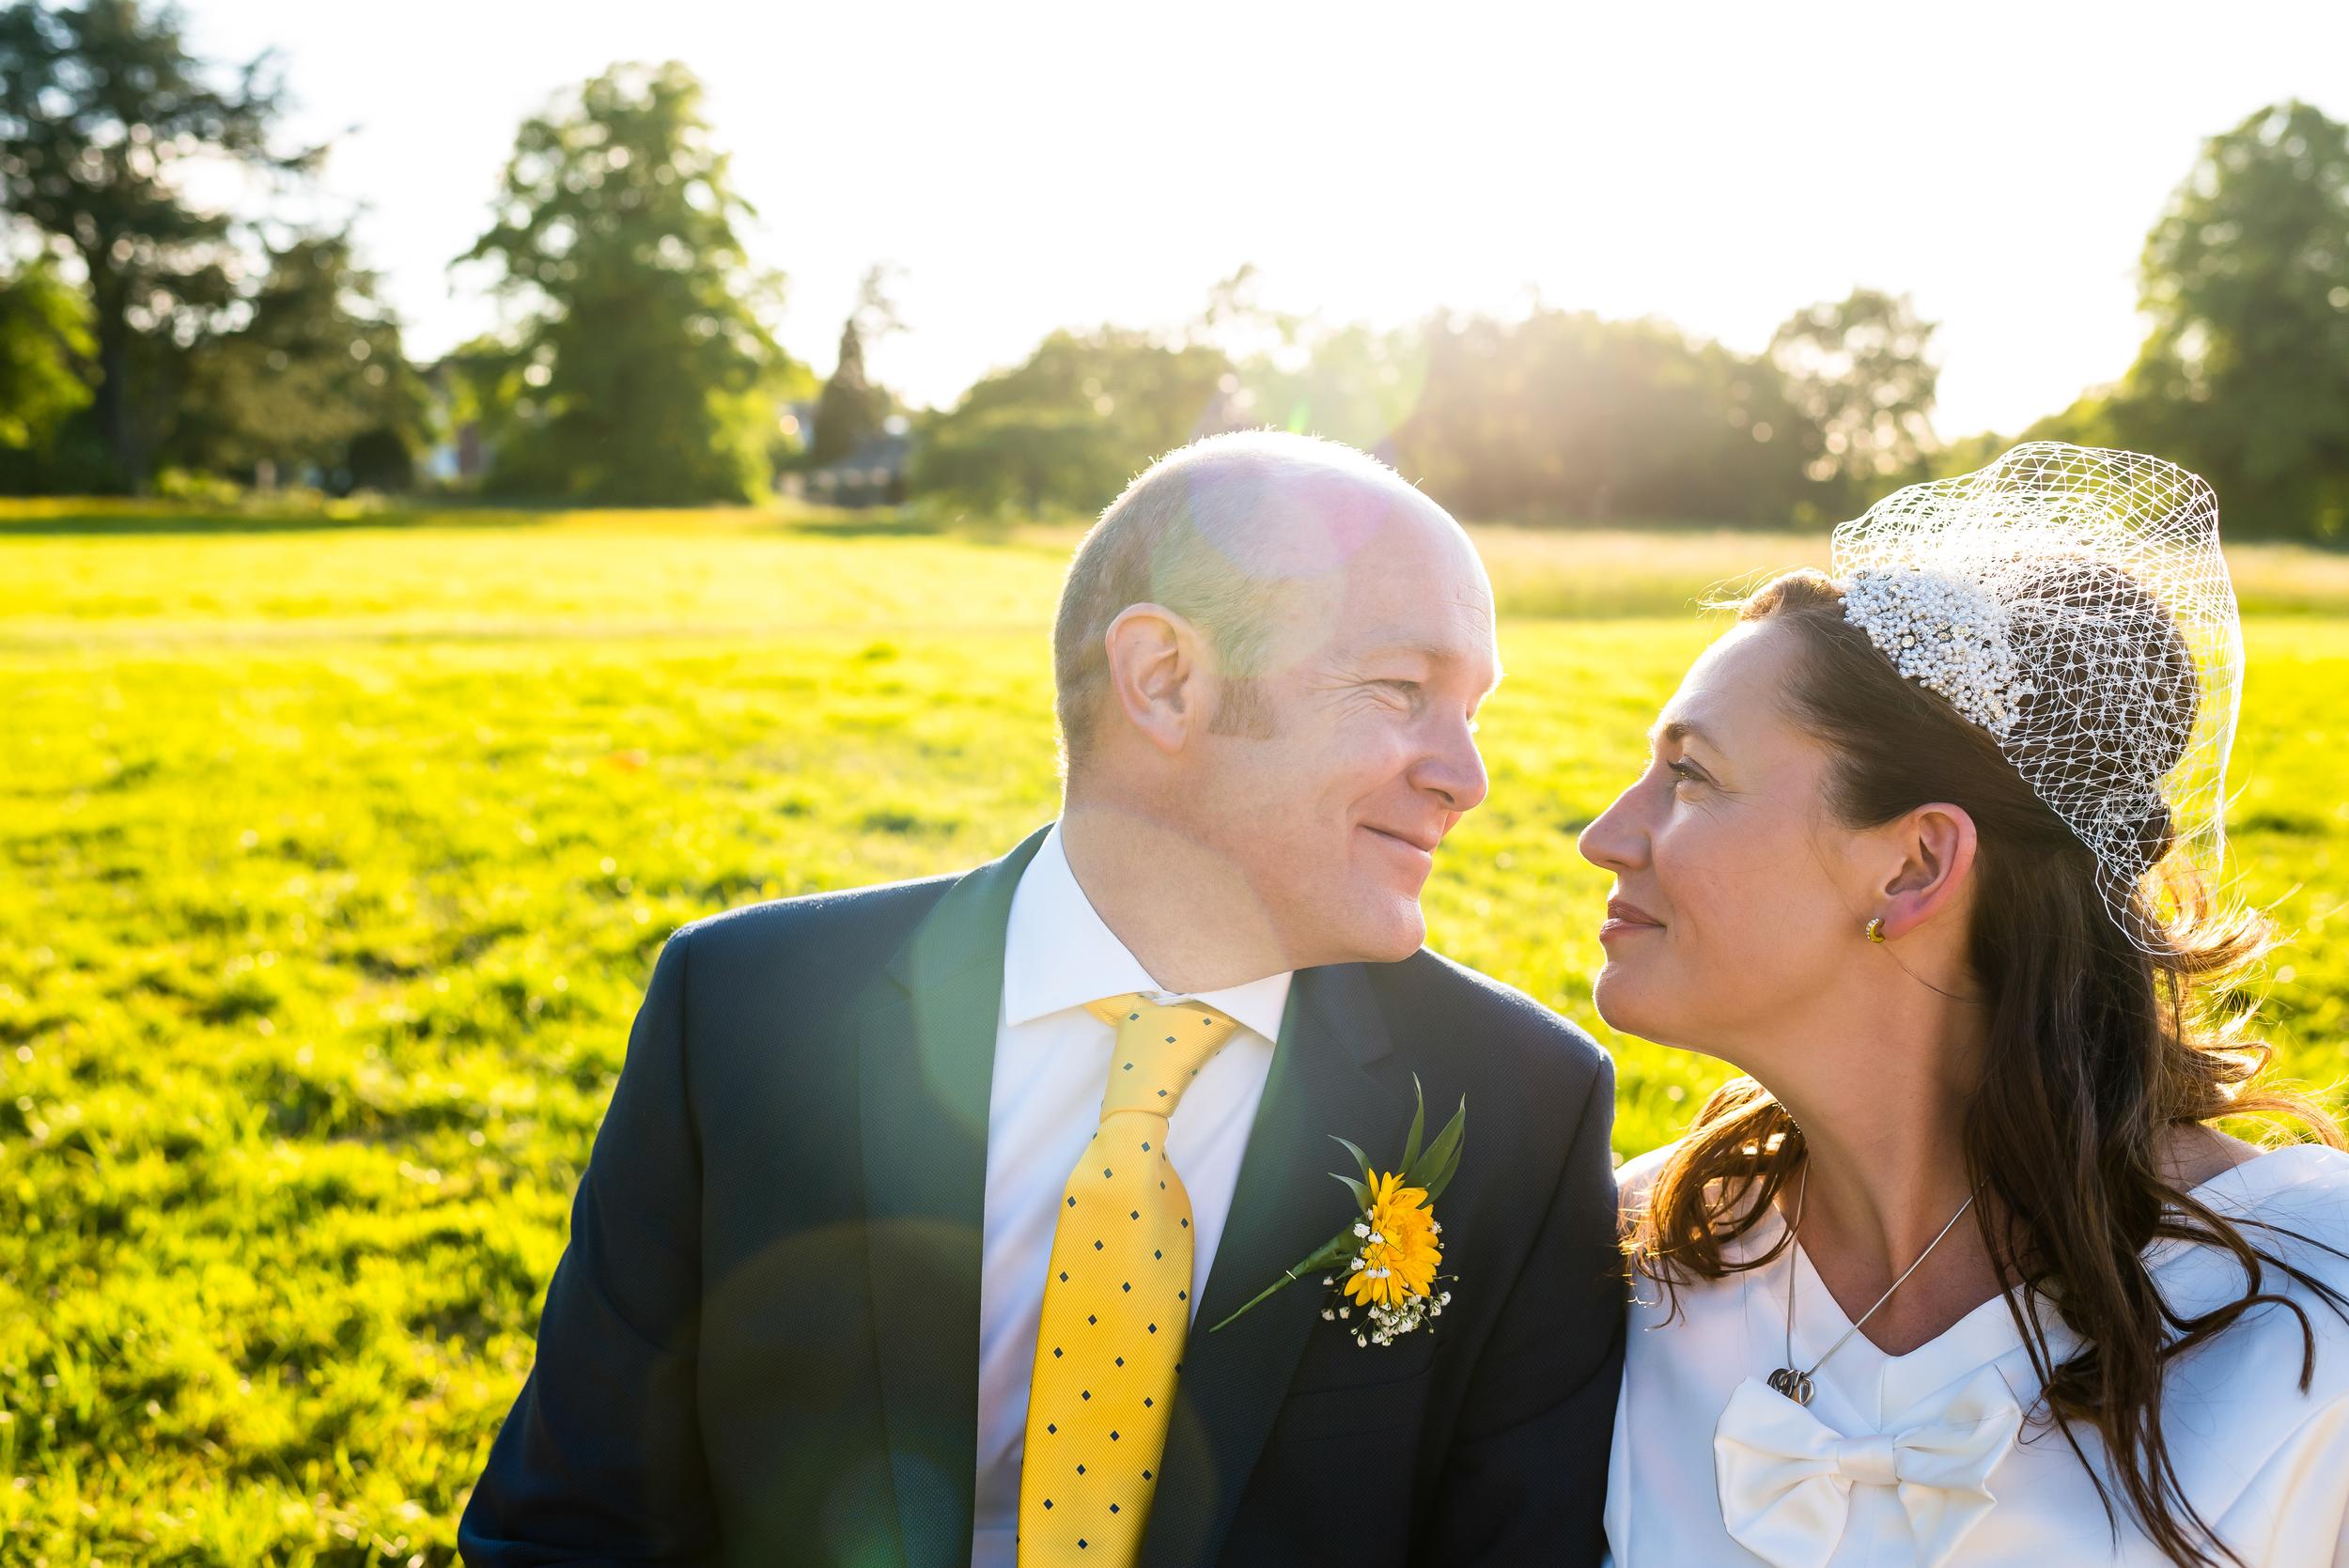 My Perfect Ceremony - Wedding Celebrant Testimonial - Nic & Steve